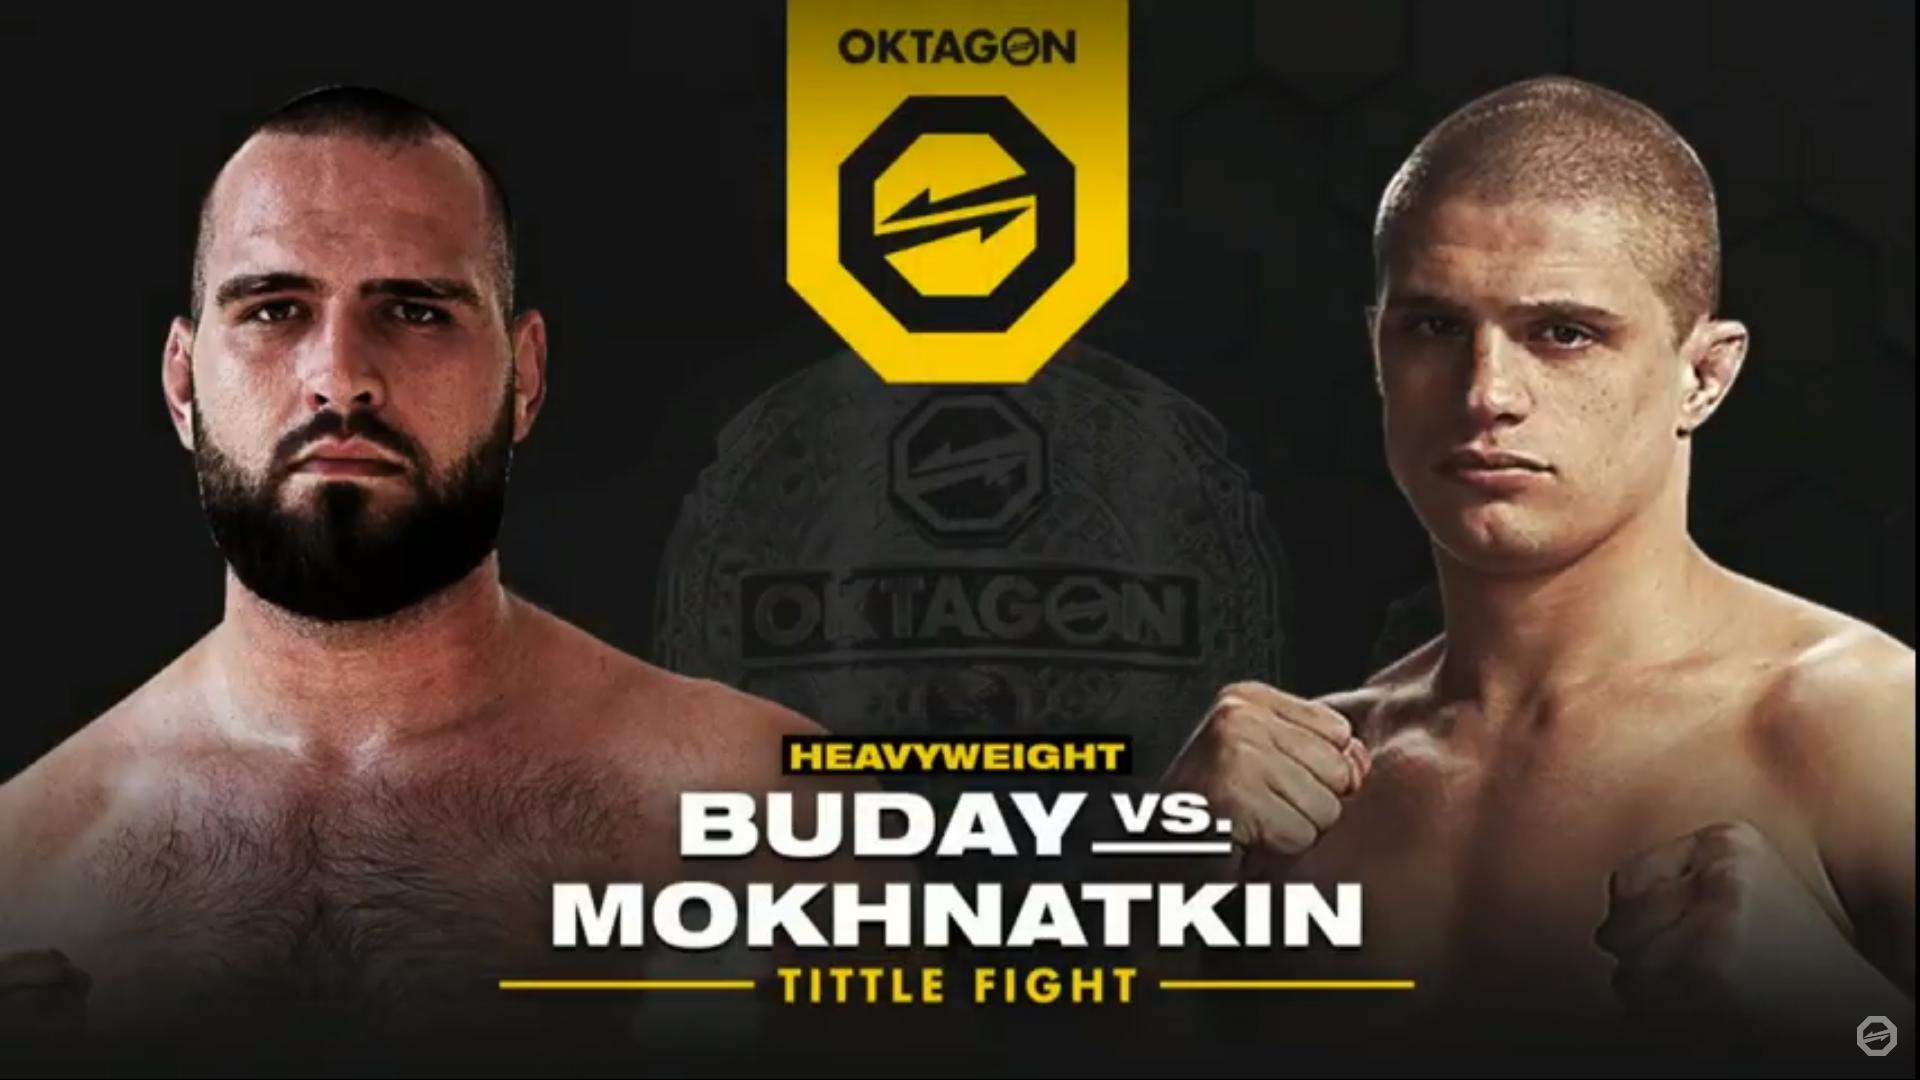 Zápas Buday vs. Mokhnatkin